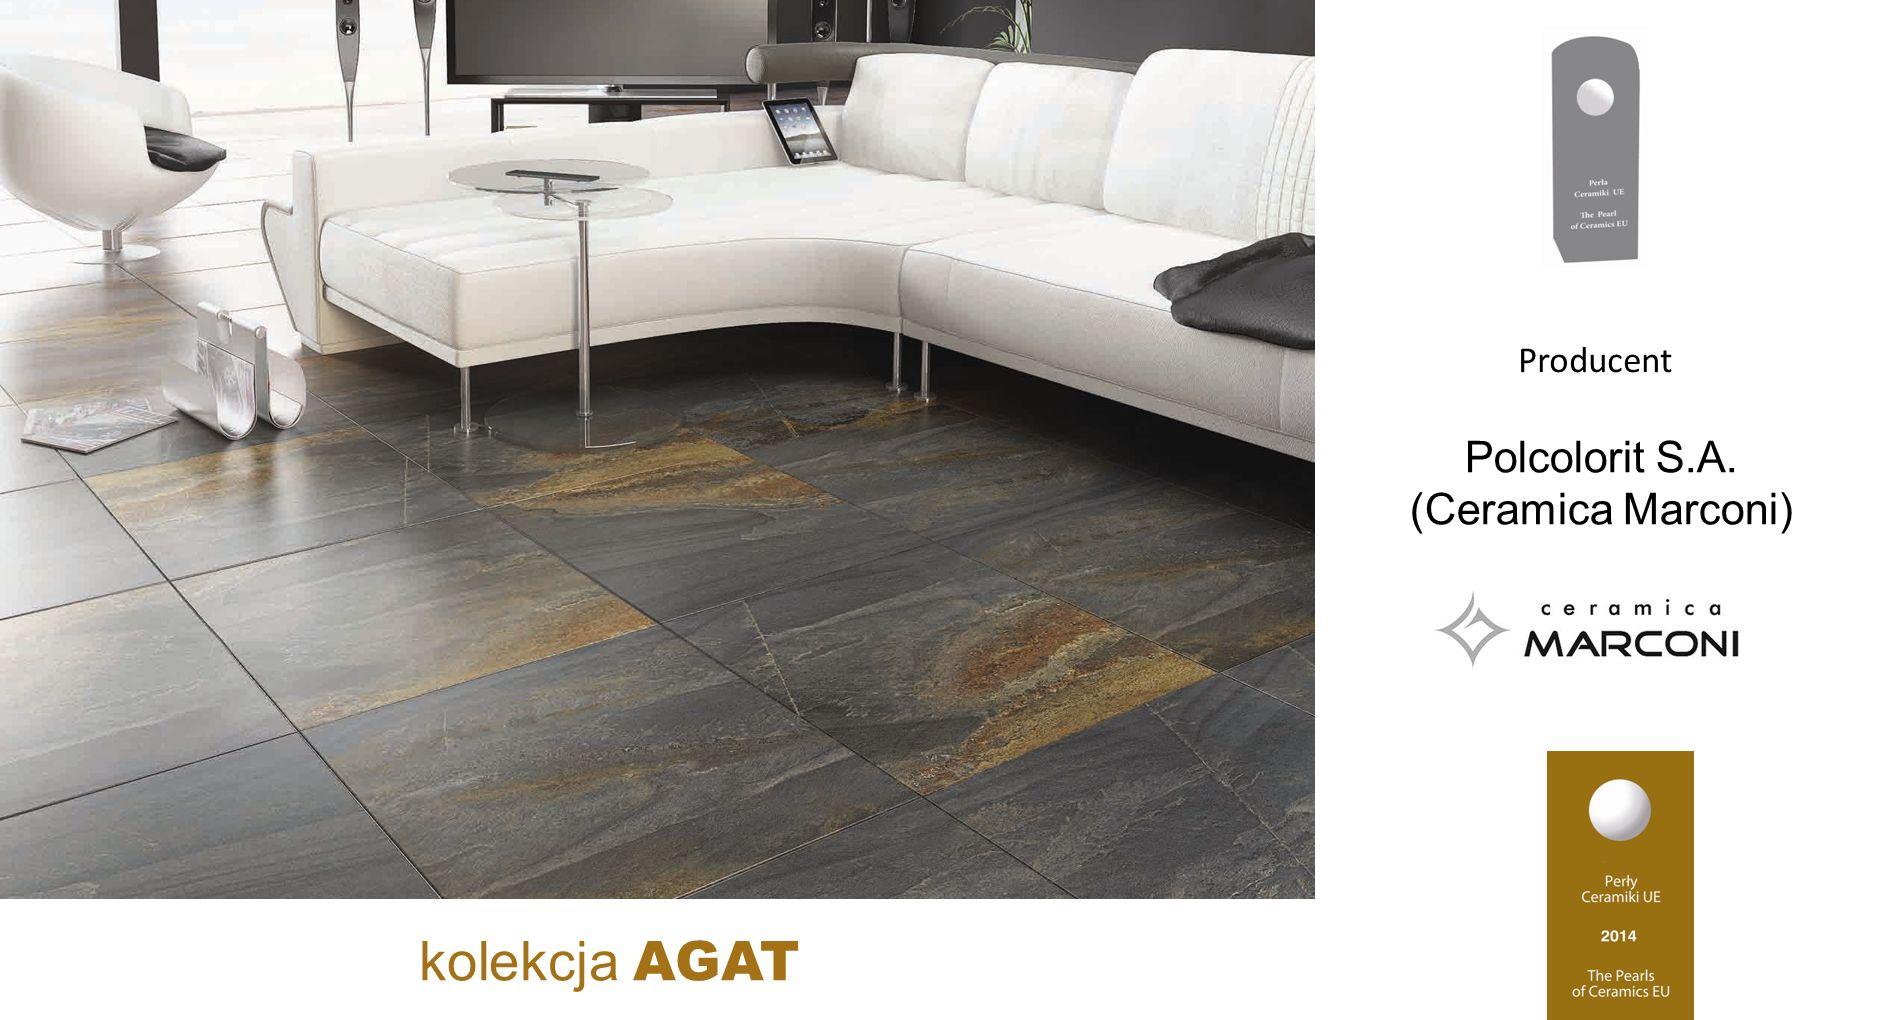 Polcolorit S.A. (Ceramica Marconi) kolekcja AGAT Producent